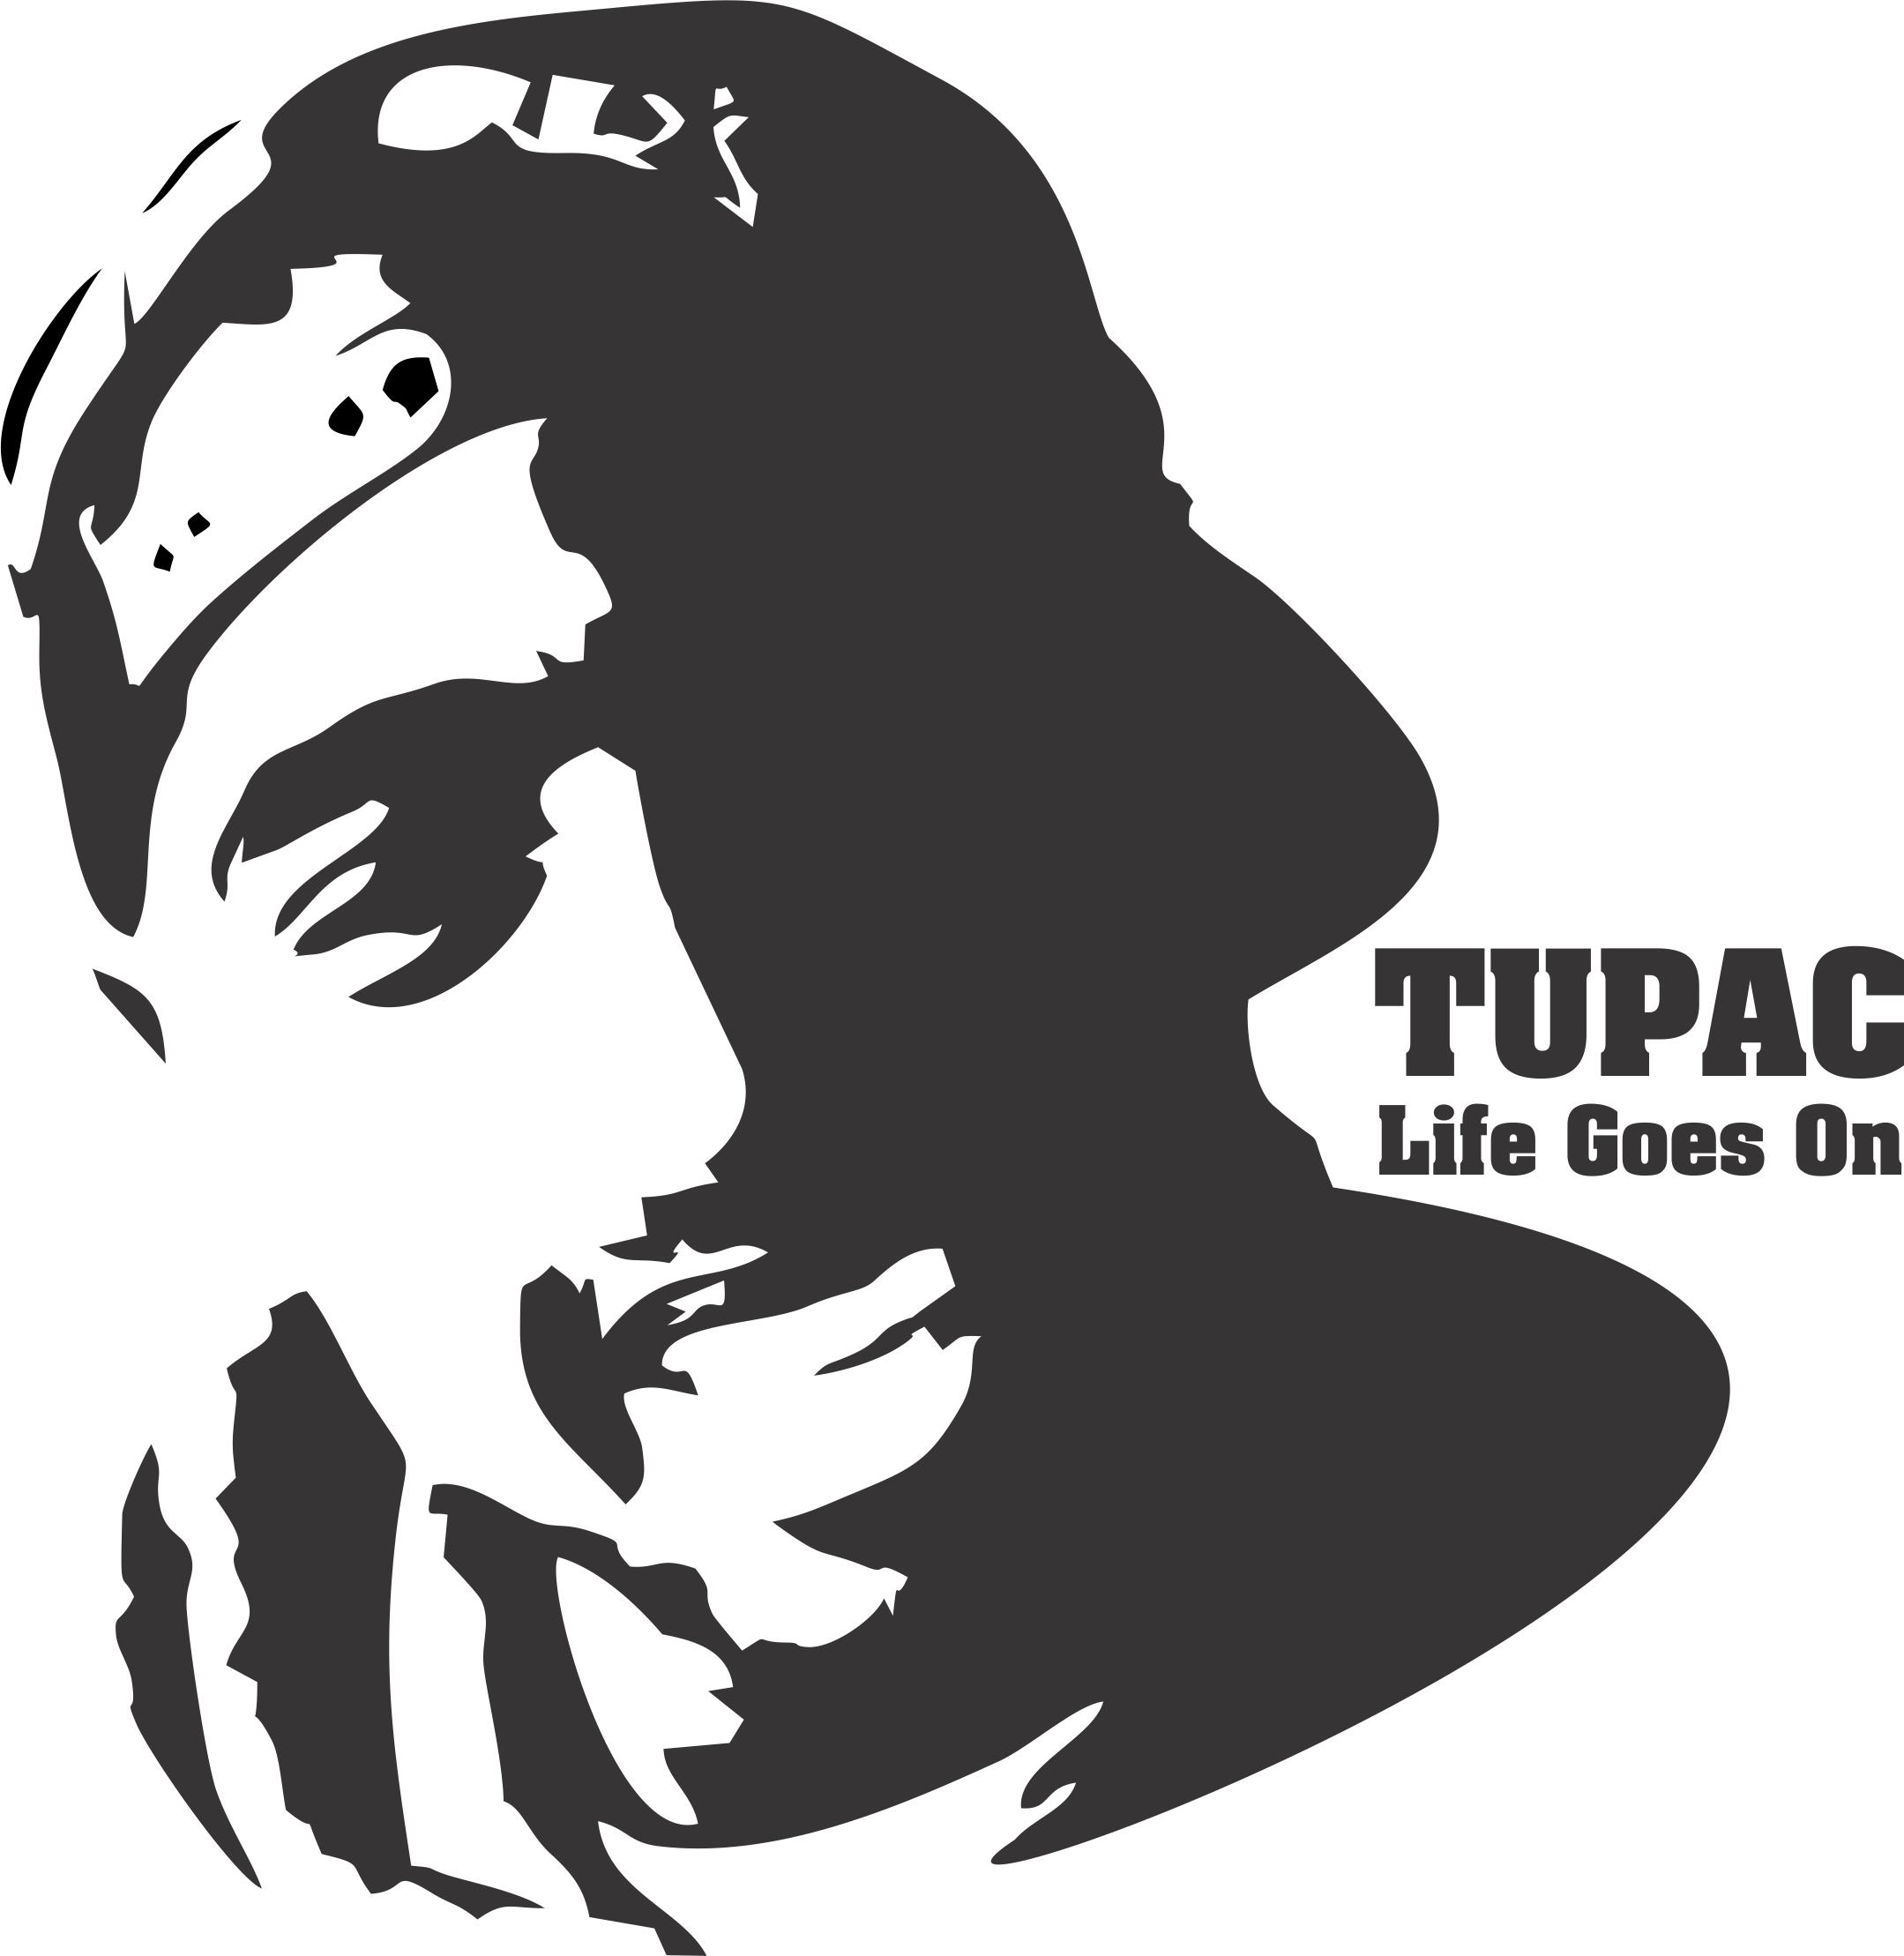 free vector Tupac Shakur T Shirt Design Vector ClipartLook.com